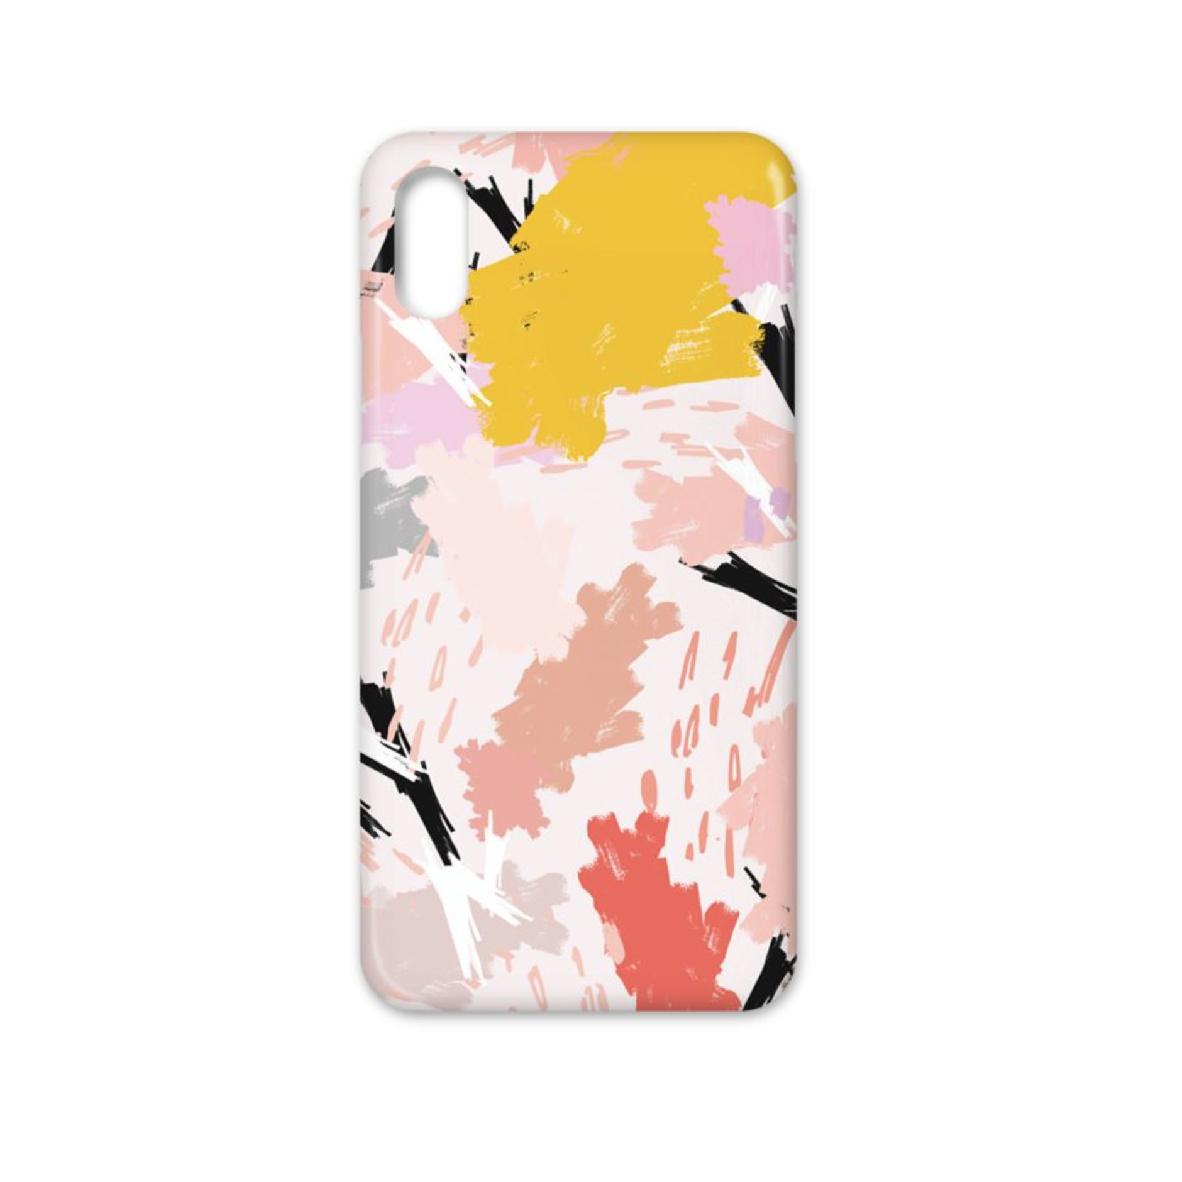 Riot iPhone X Case